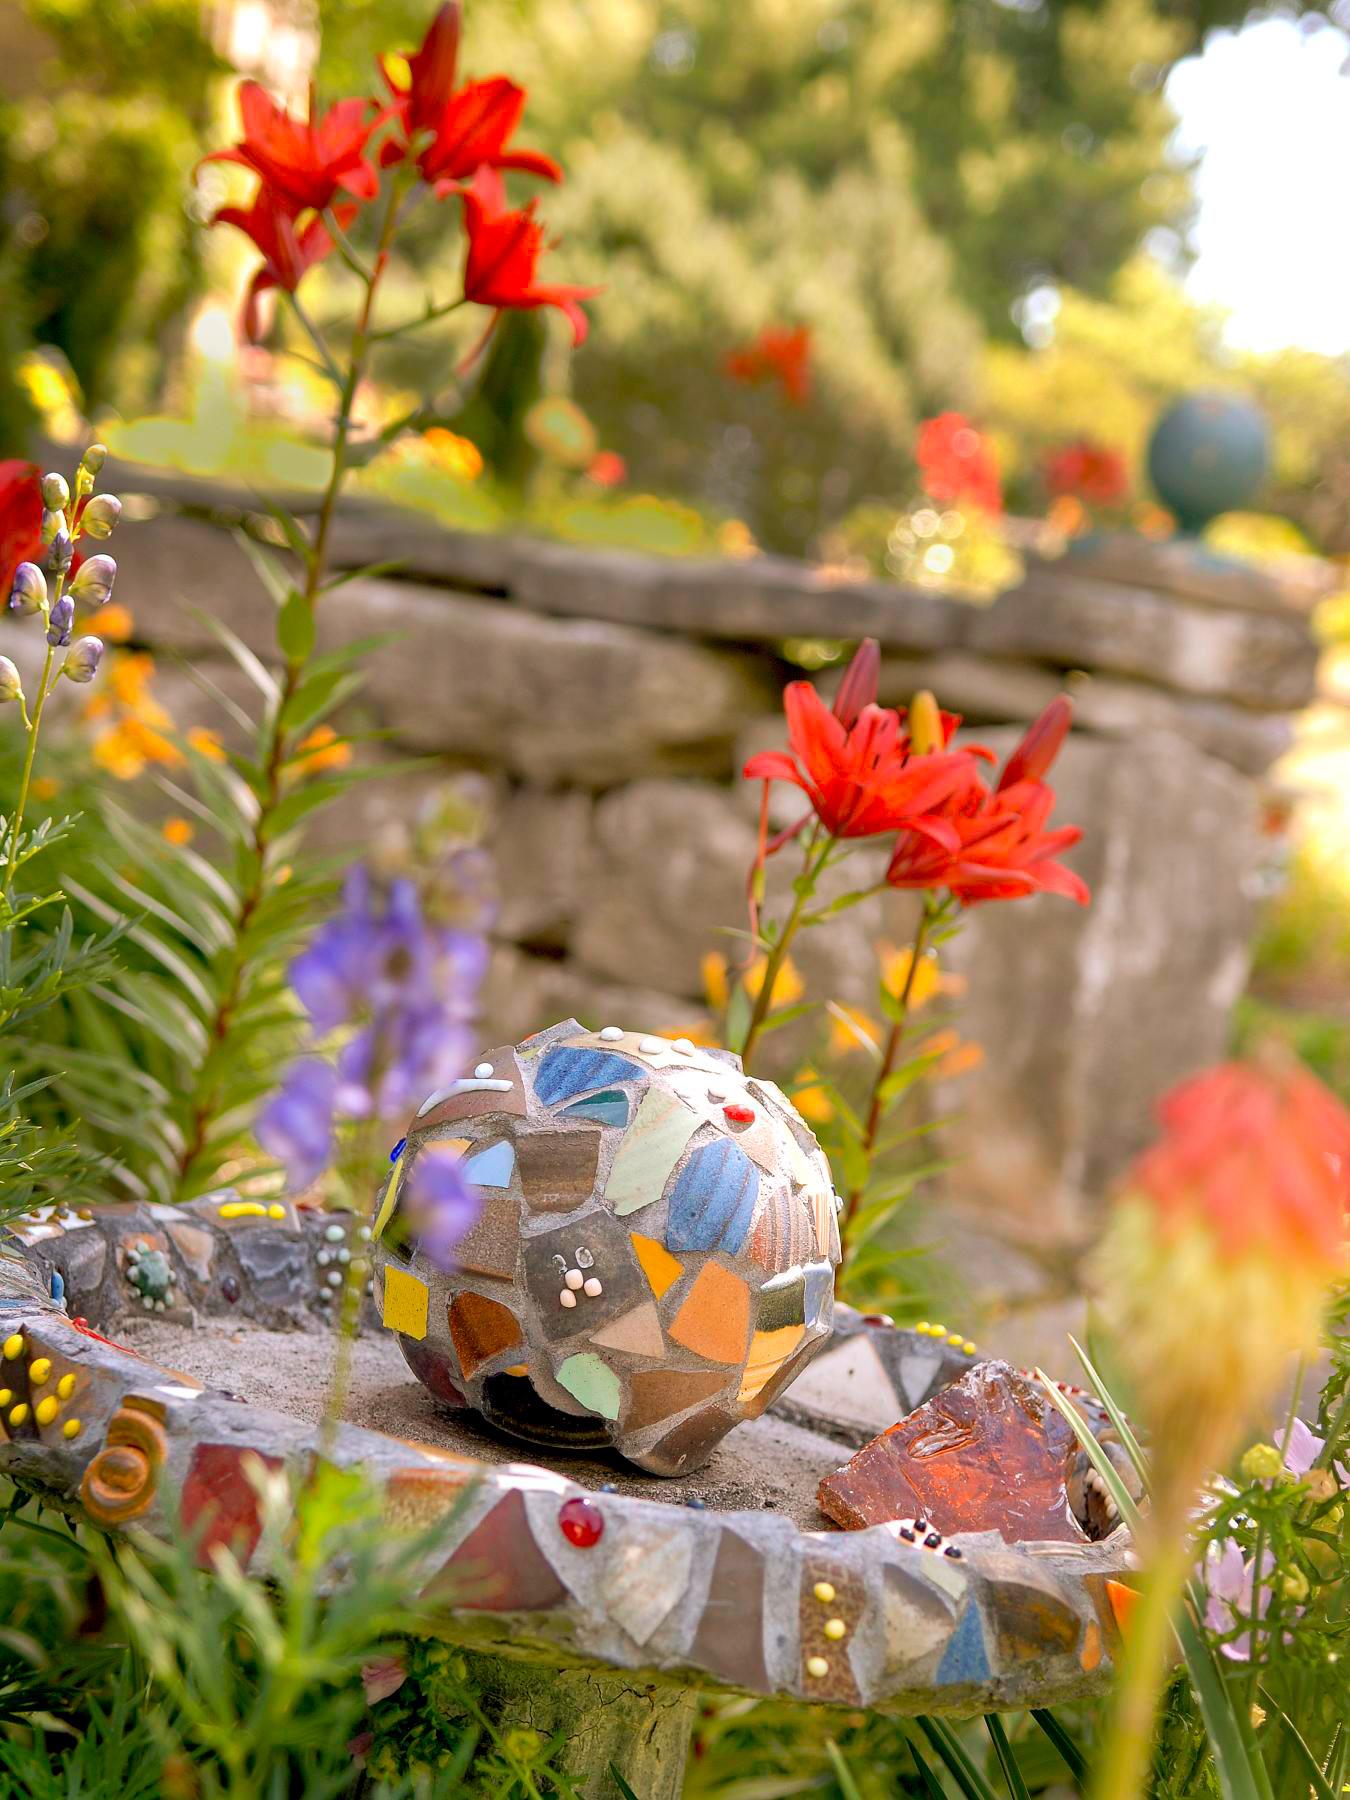 A mosaic garden